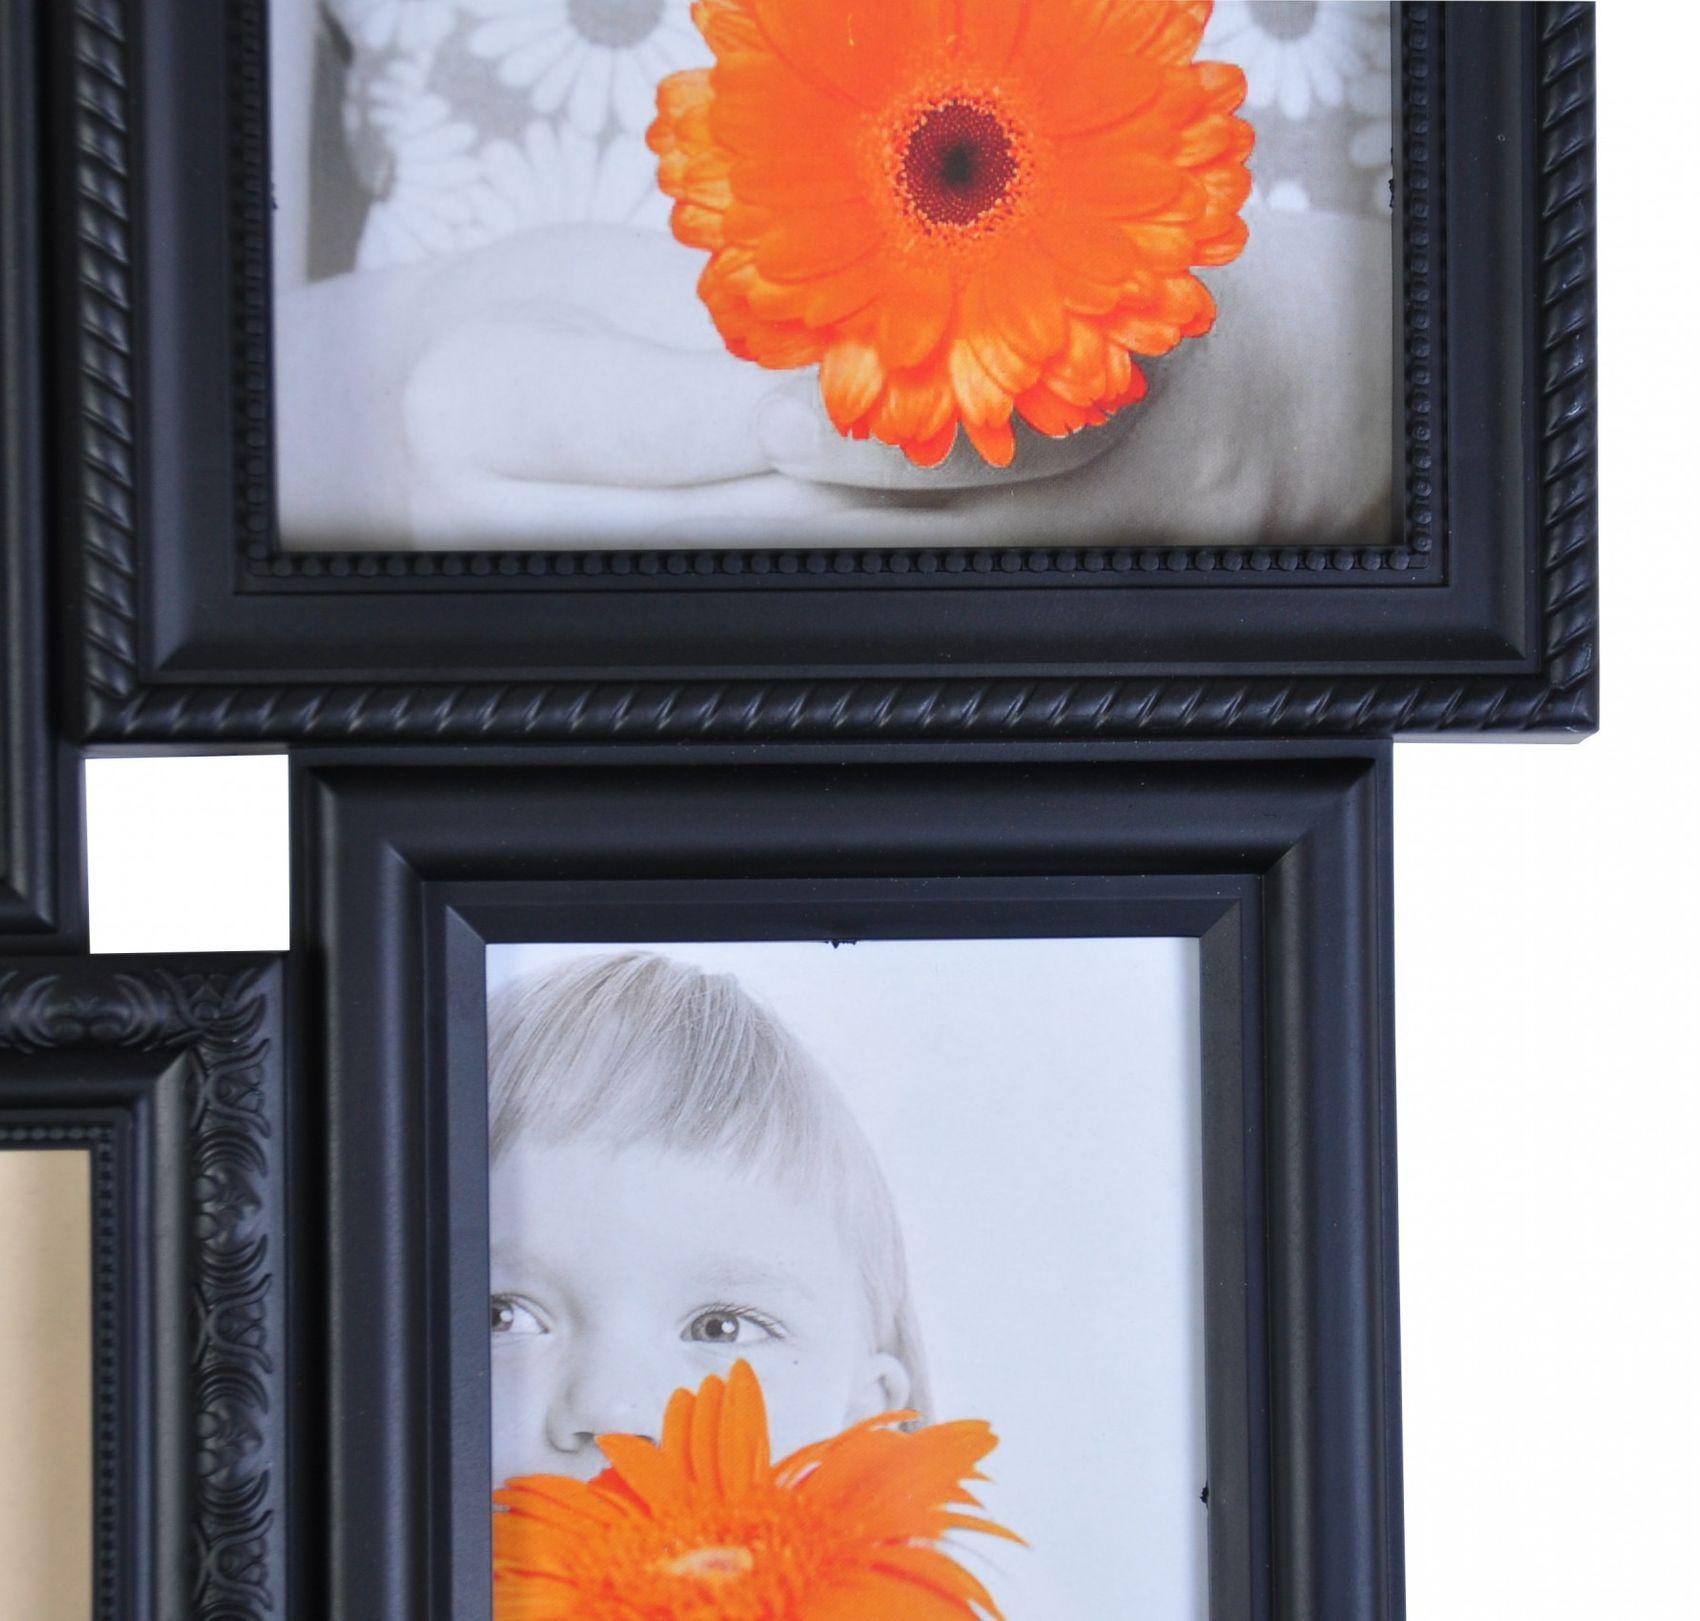 3D Bilderrahmen Collage für 6 Fotos Wandgalerie Fotorahmen Galerie ...